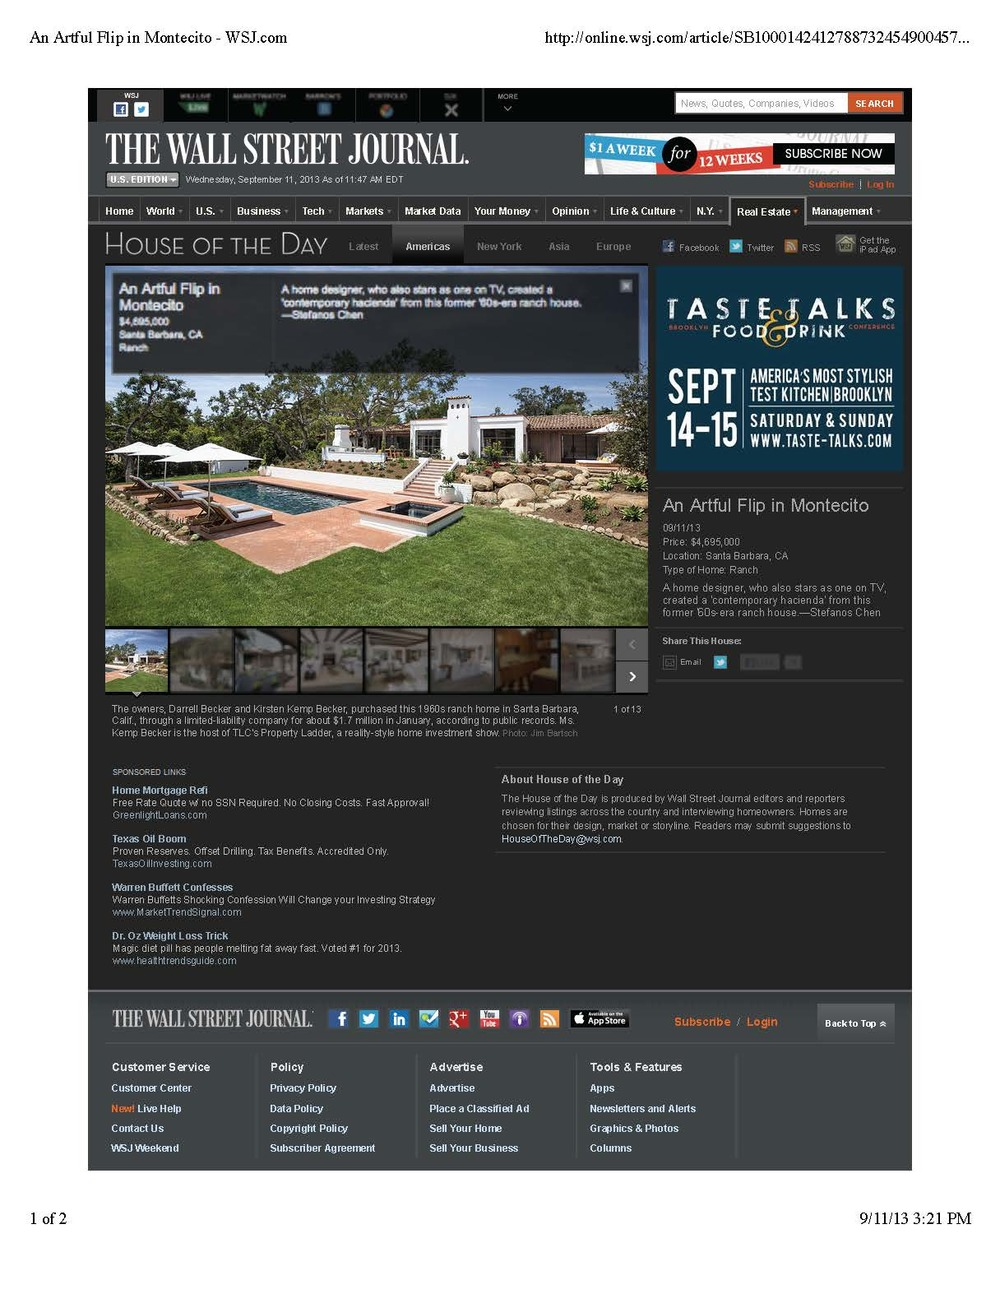 An Artful Flip in Montecito - WSJ.com